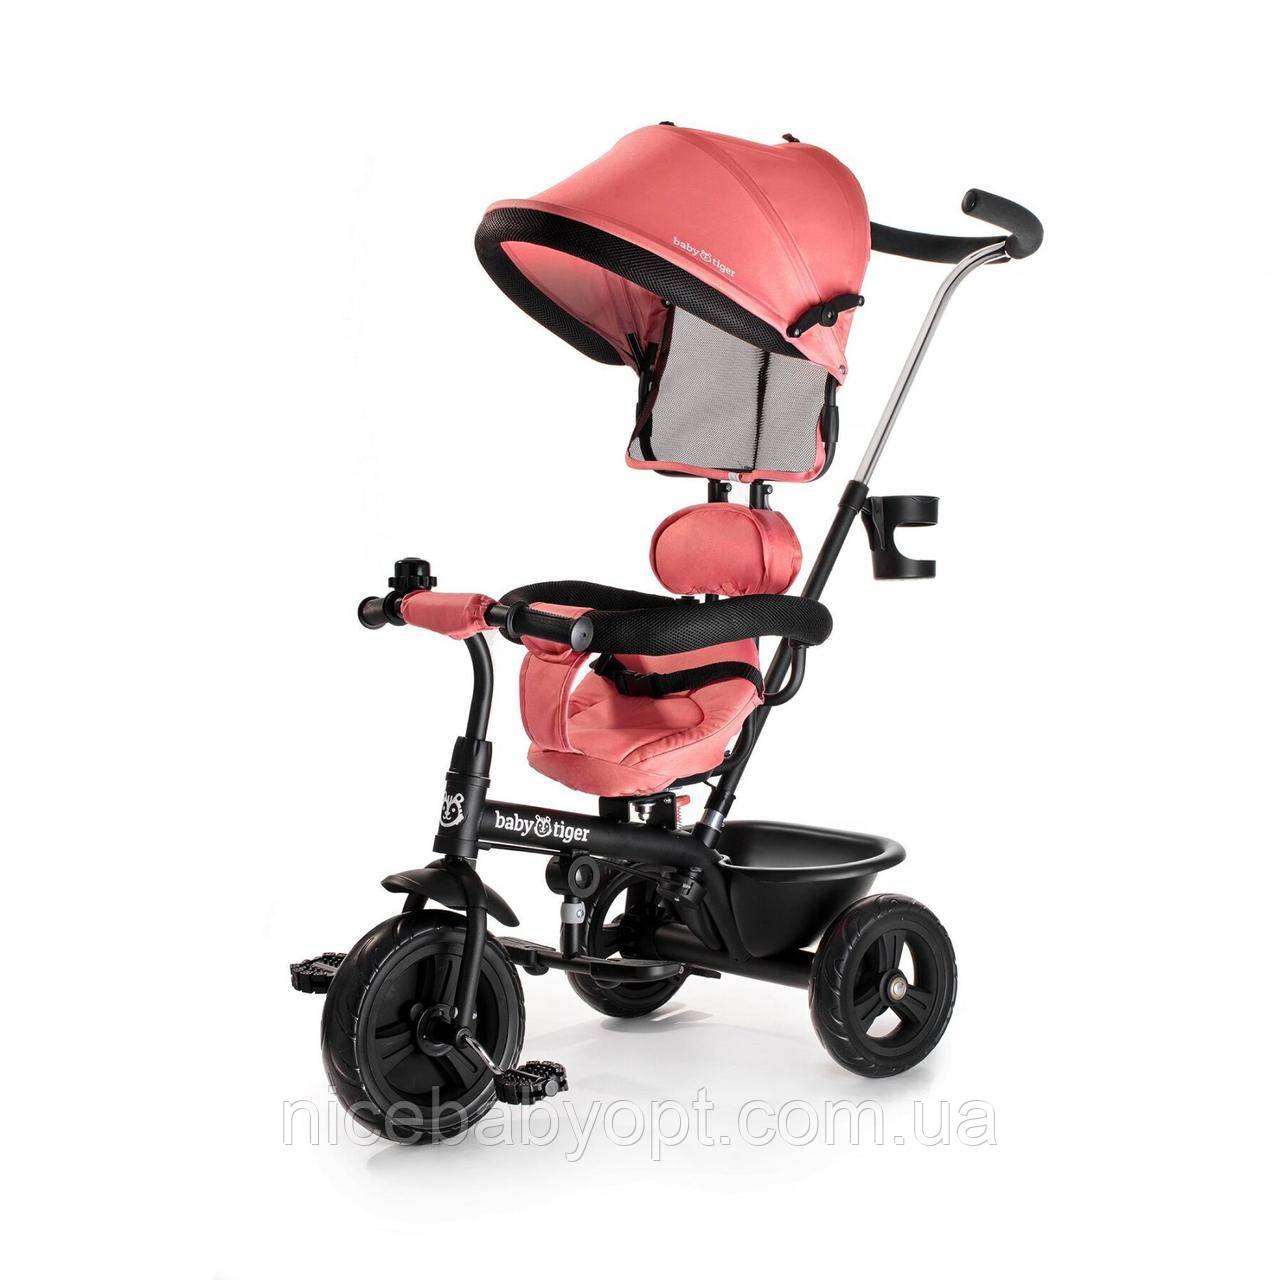 Триколісний велосипед Babytiger Fly Coral (BTRFLYCRL00000)